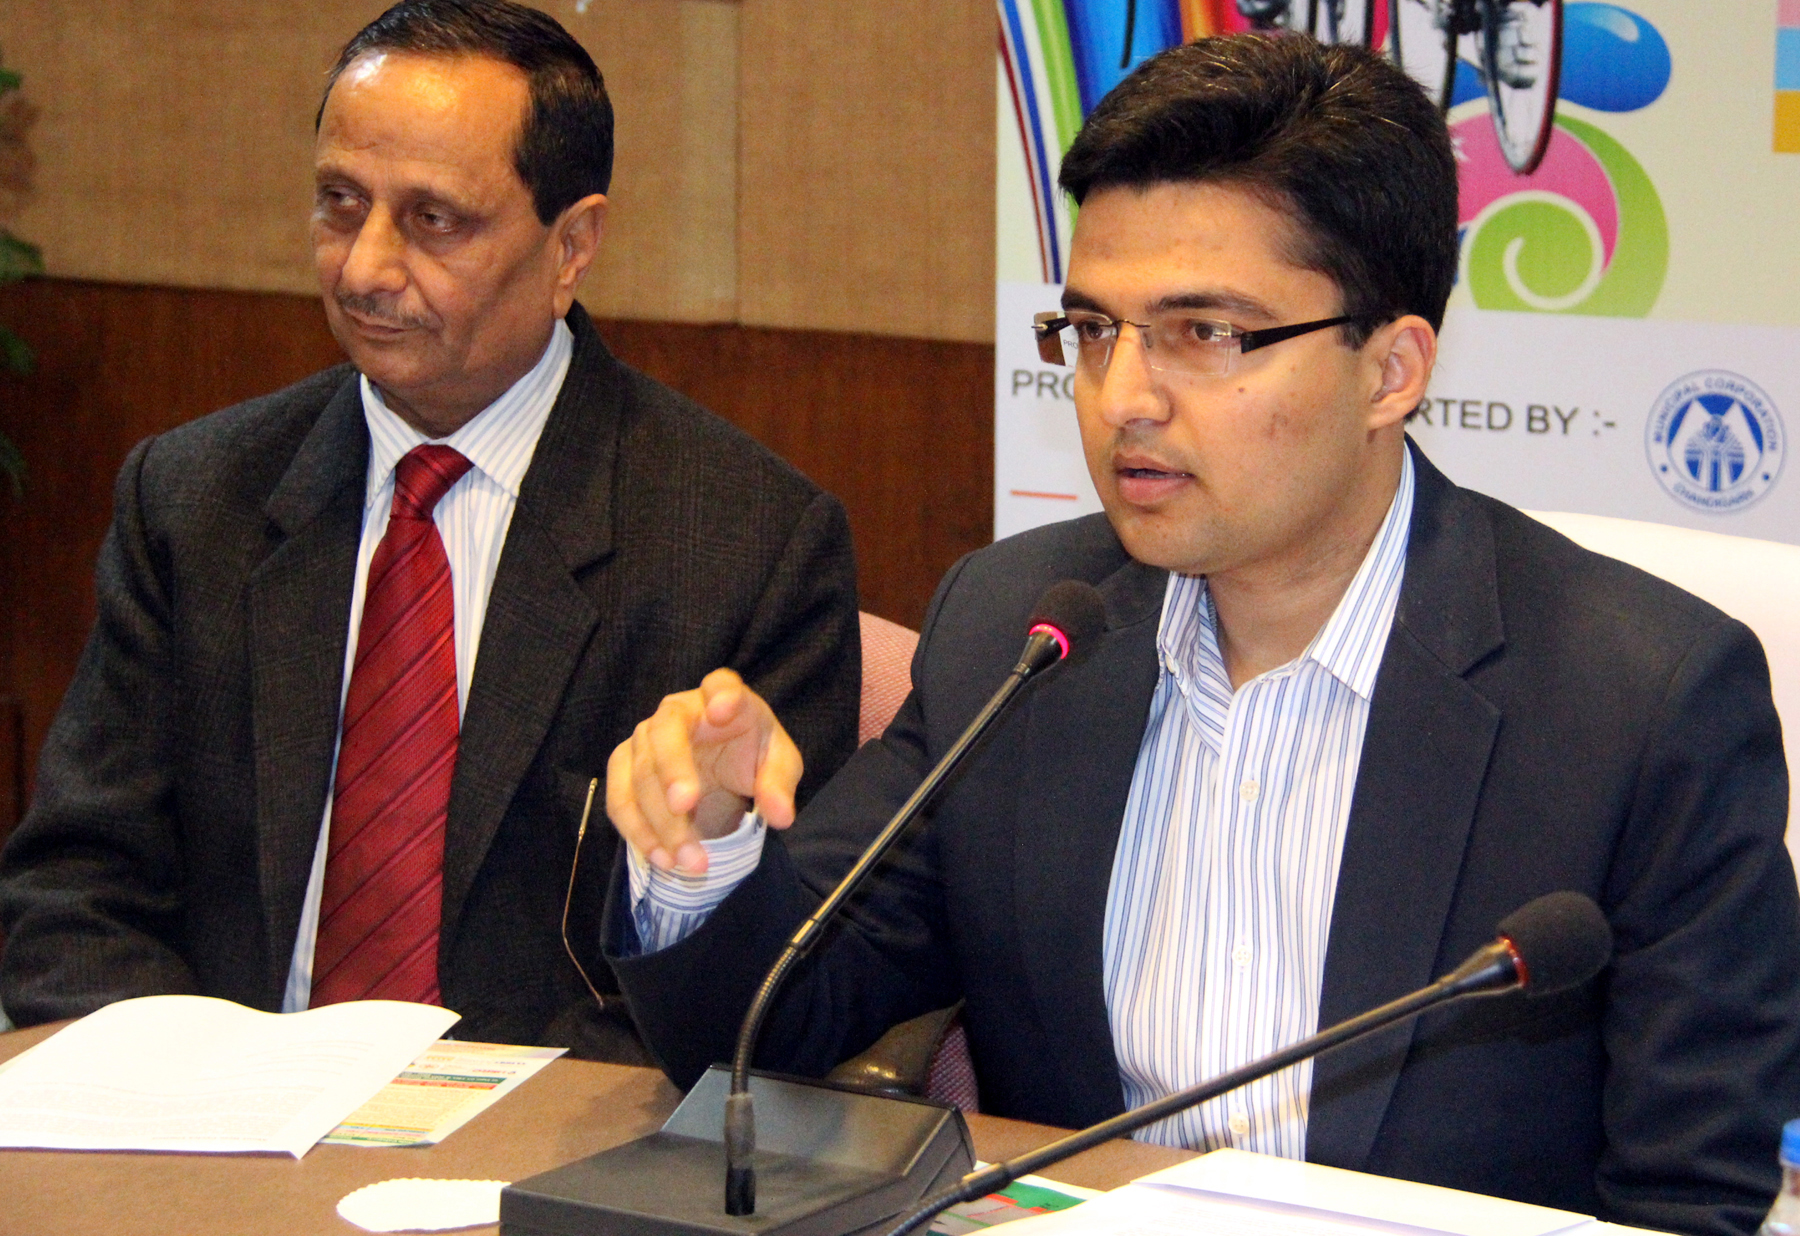 UT SDM-cum-Director Tourism, Shri Kashish Mittal presiding over the press conference regarding �4th National Chandigarh Cyclothon-2014� at UT State Guest House, Chandiarh on Thursday, December,18, 2014.